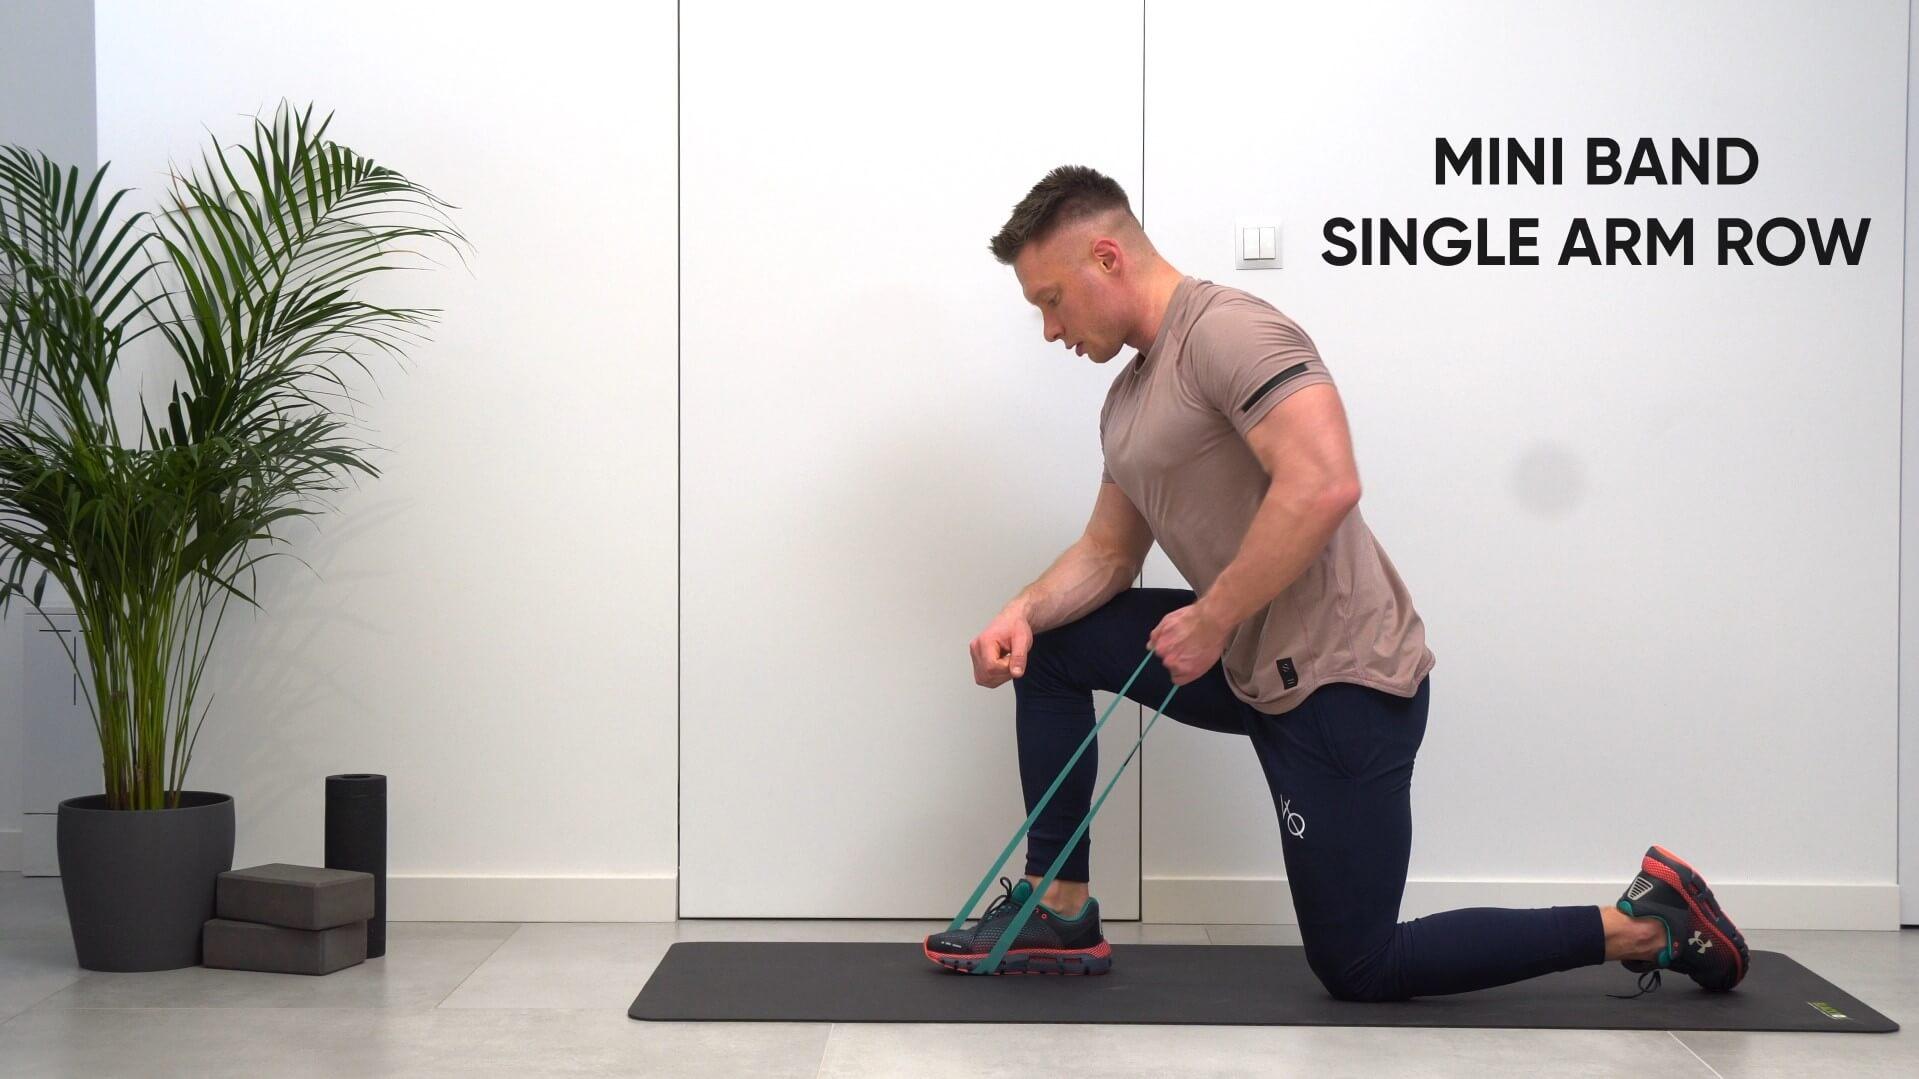 Mini band single arm row